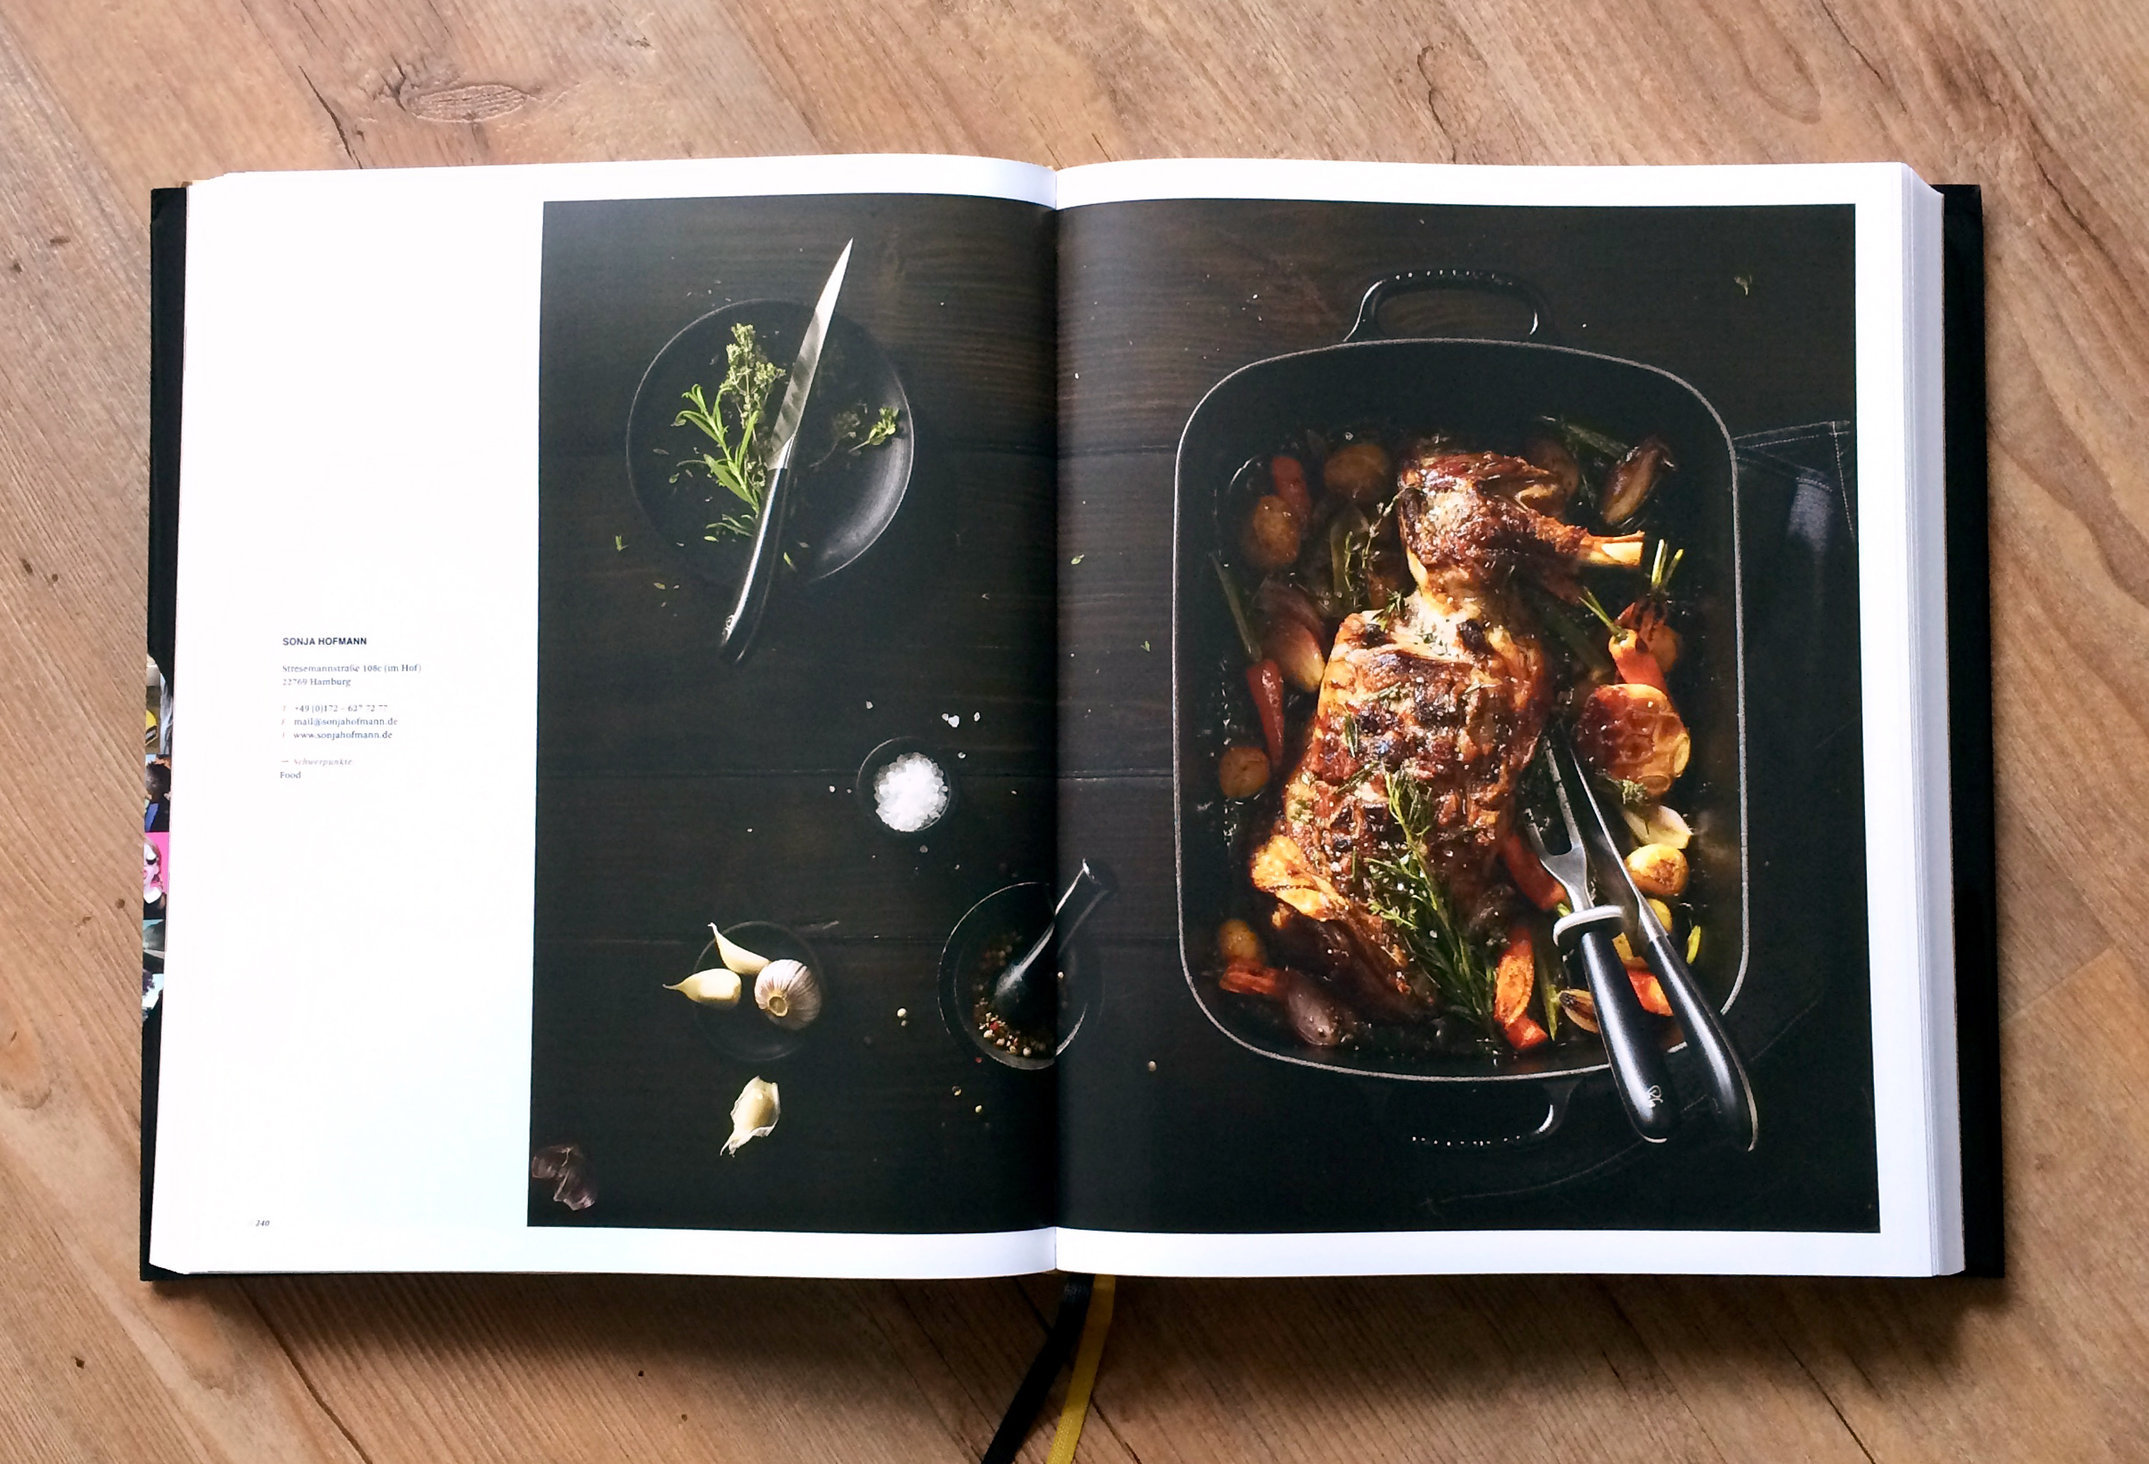 Buch: Blickfang - Deutschlands beste Fotografen